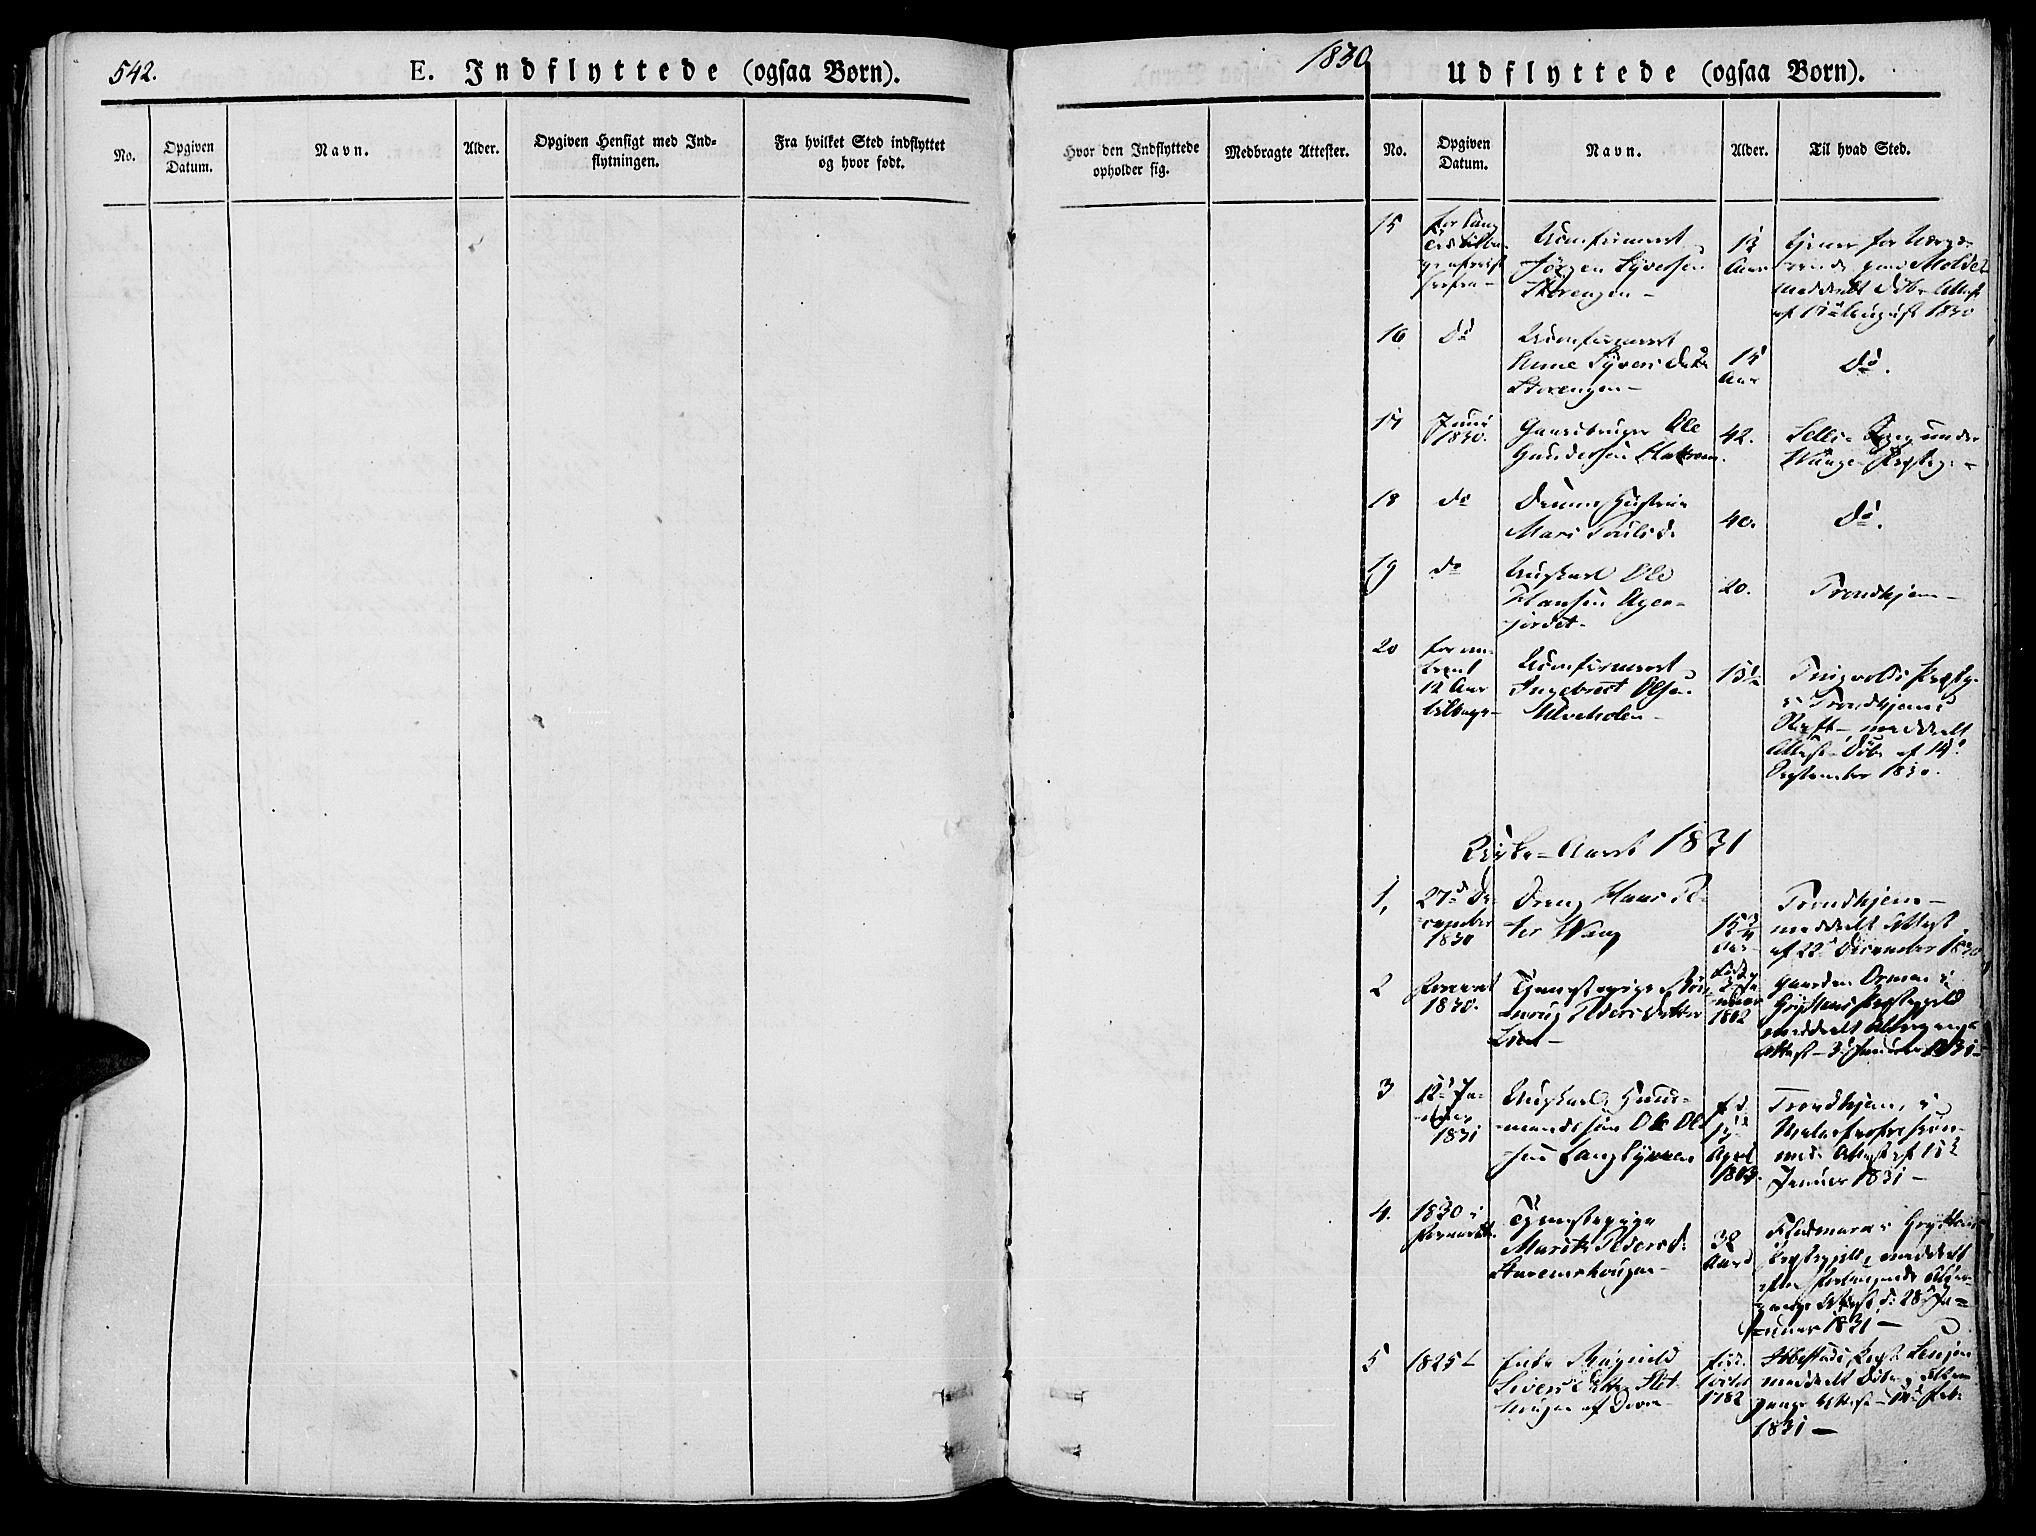 SAH, Lesja prestekontor, Ministerialbok nr. 5, 1830-1842, s. 542